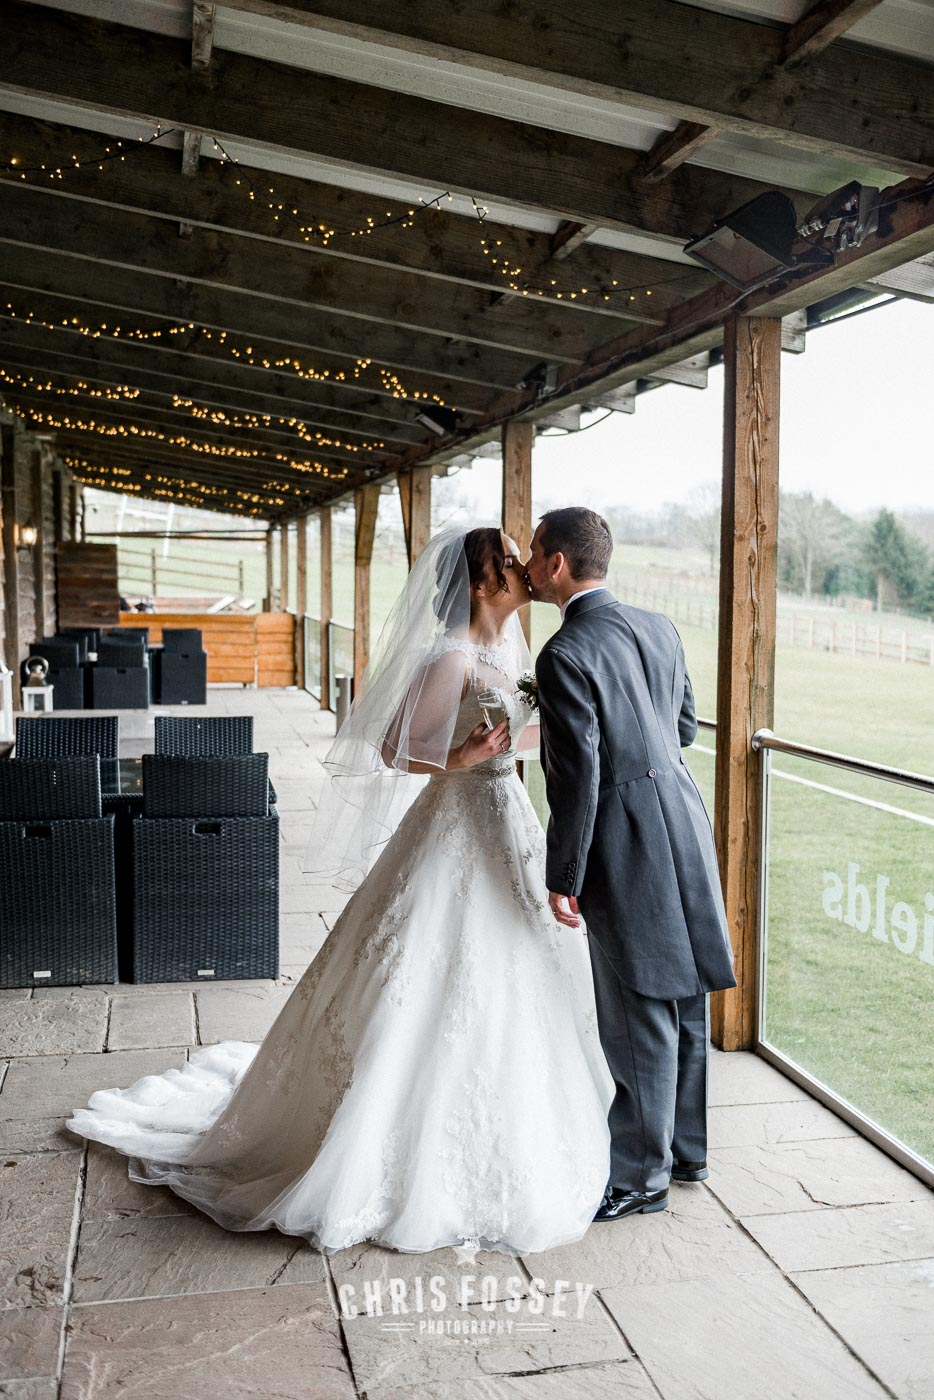 Skylark Farm Daventry Wedding Reception Photography